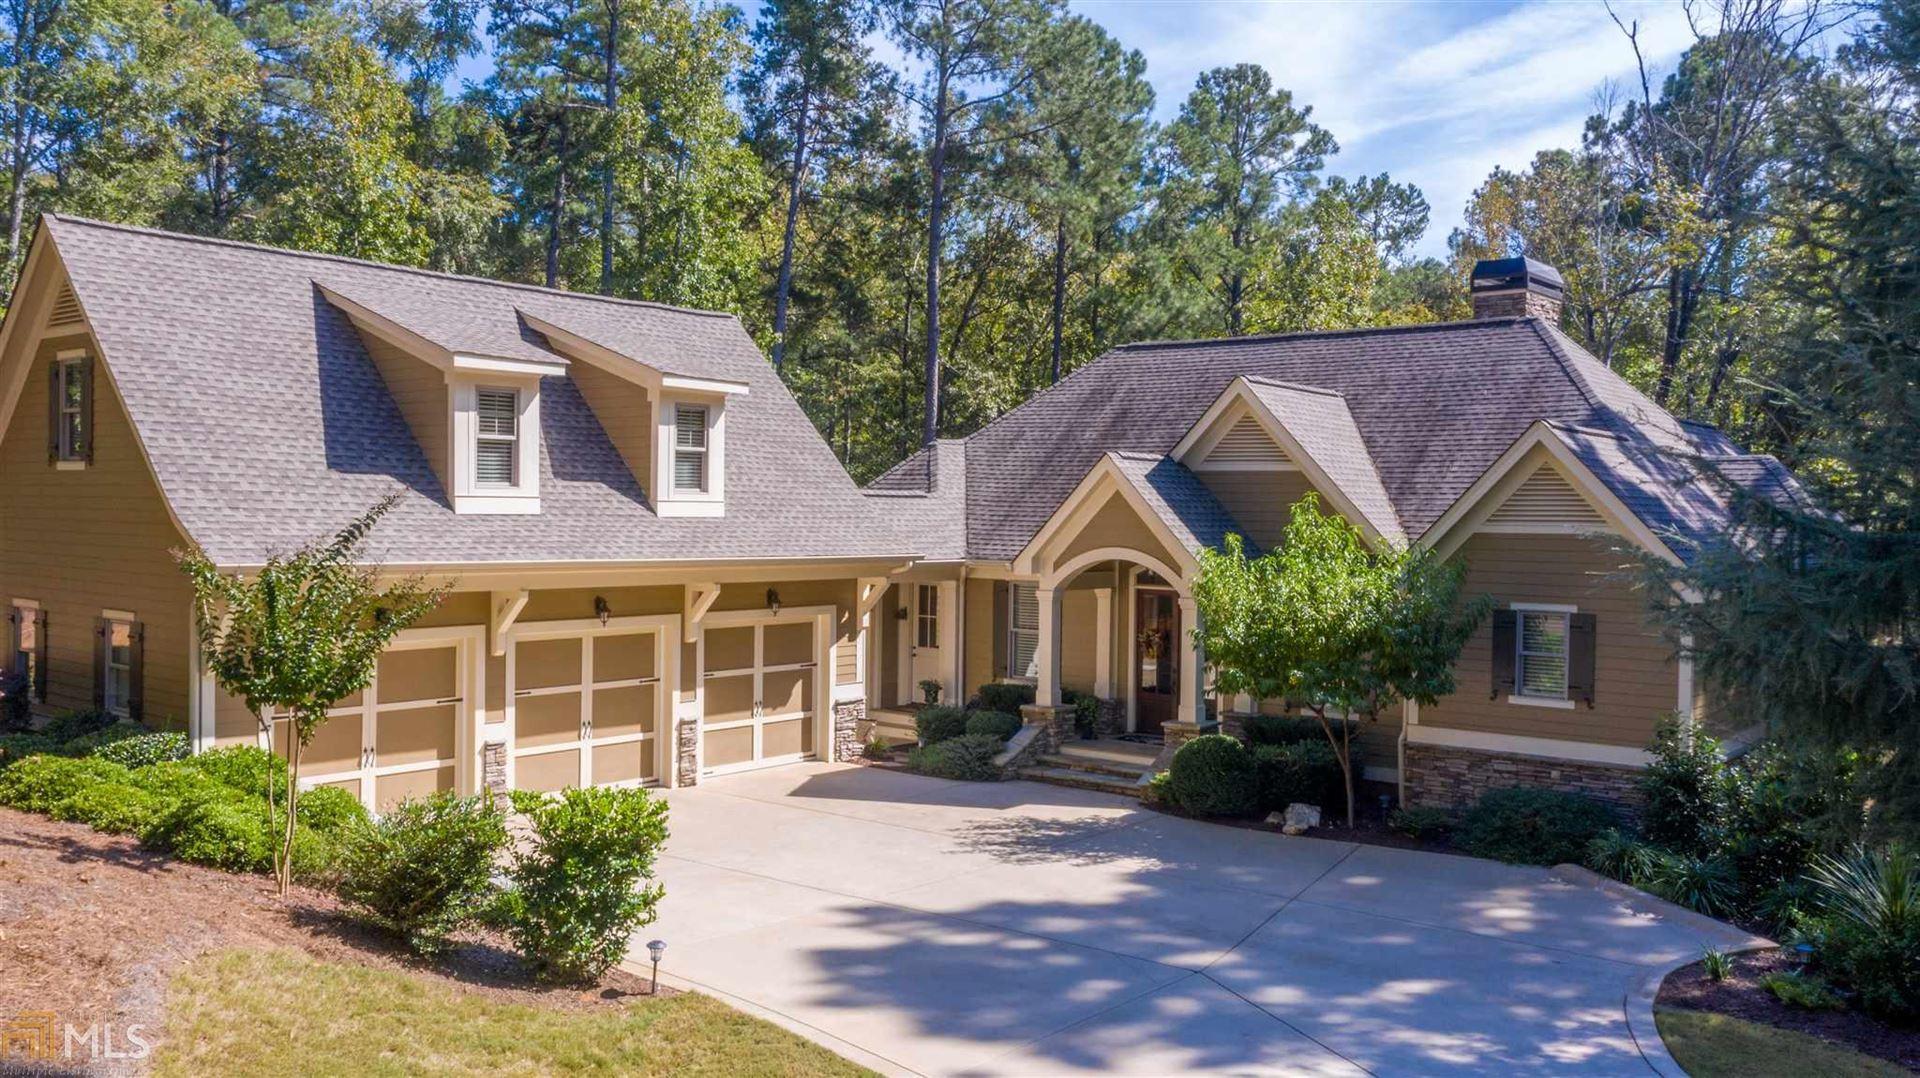 1010 Jones Bluff Ct, Greensboro, GA 30642 - MLS#: 8871307